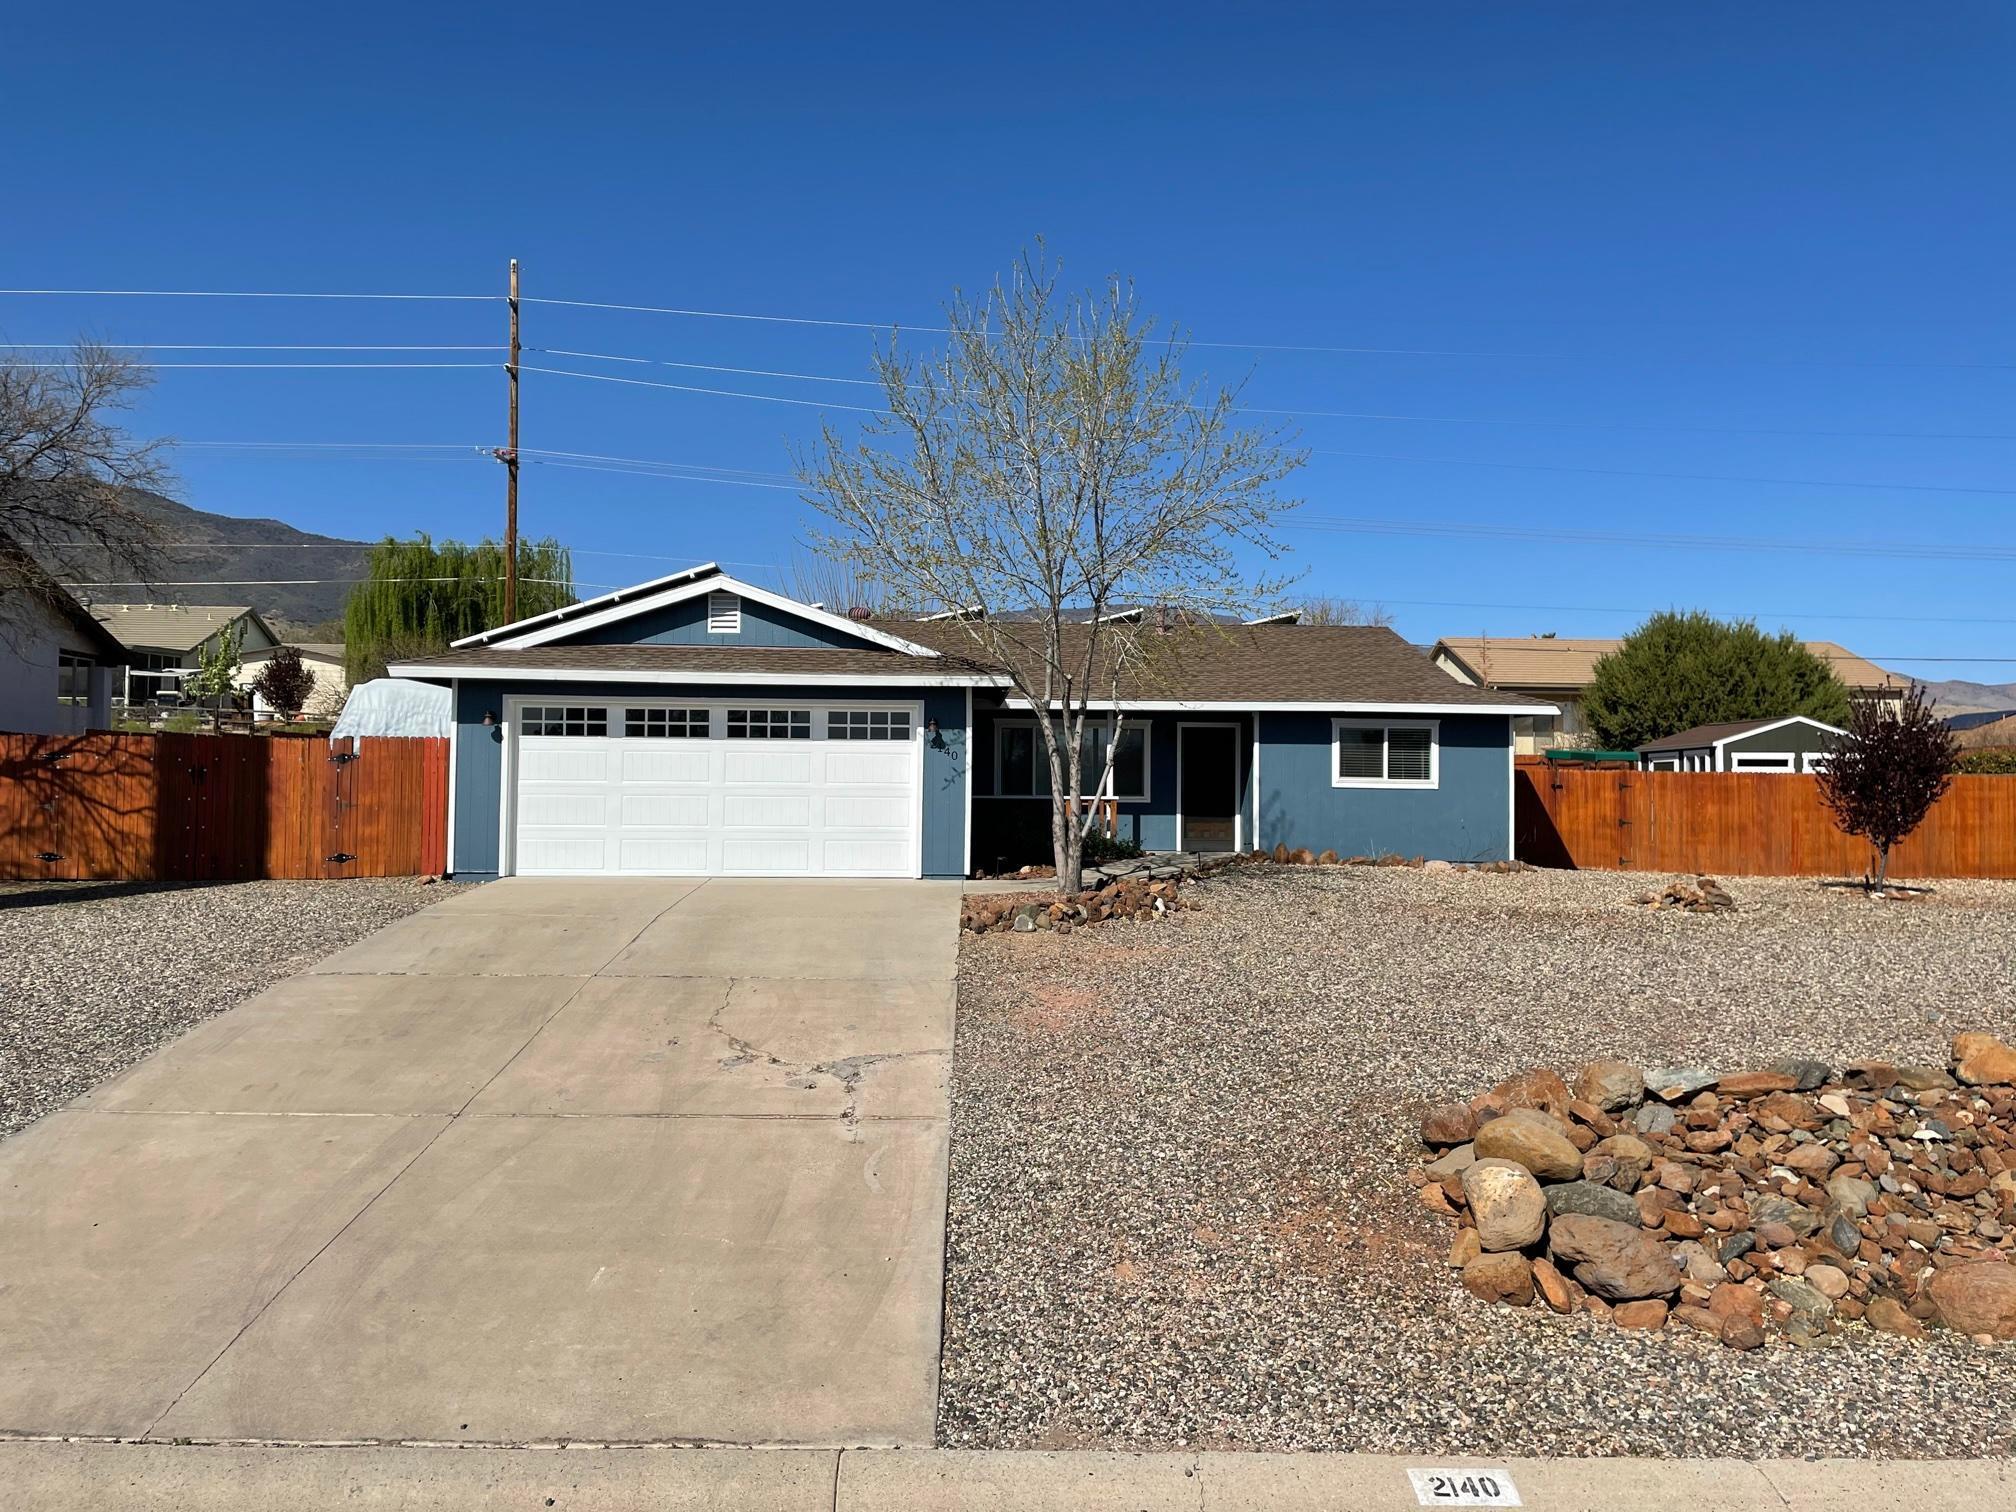 2140 Sky Drive Clarkdale, AZ 86324